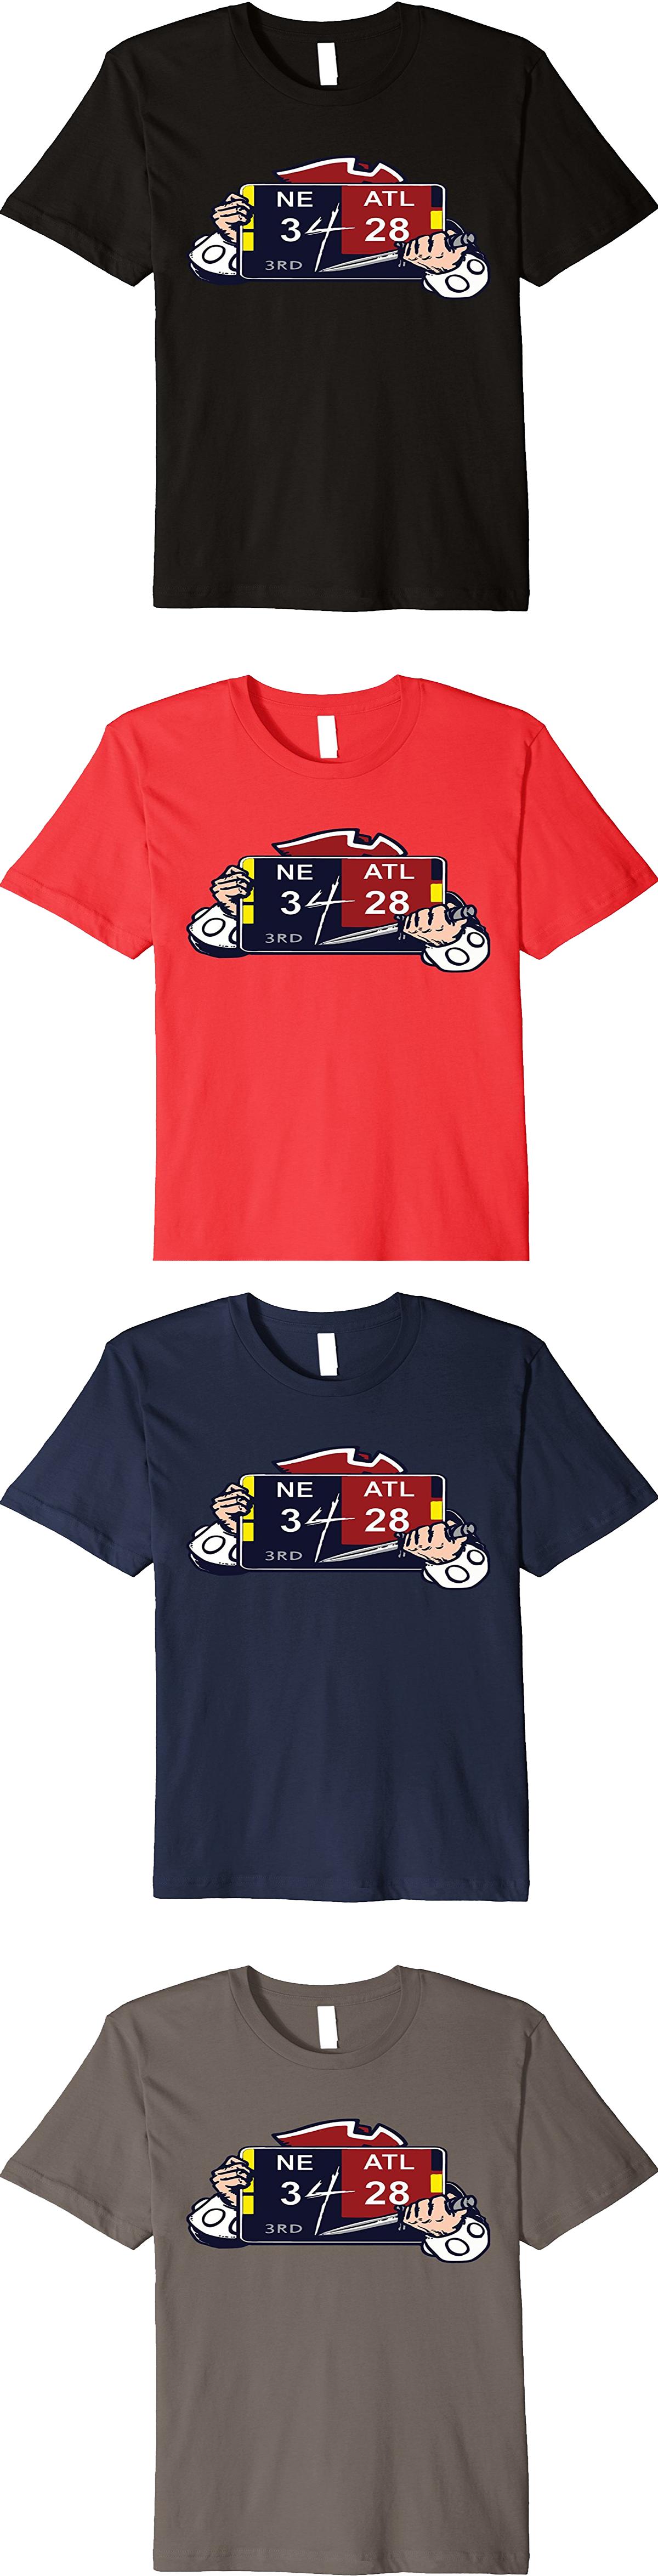 best website 6b34c 22d7f Patriots Shirts Amazon | RLDM